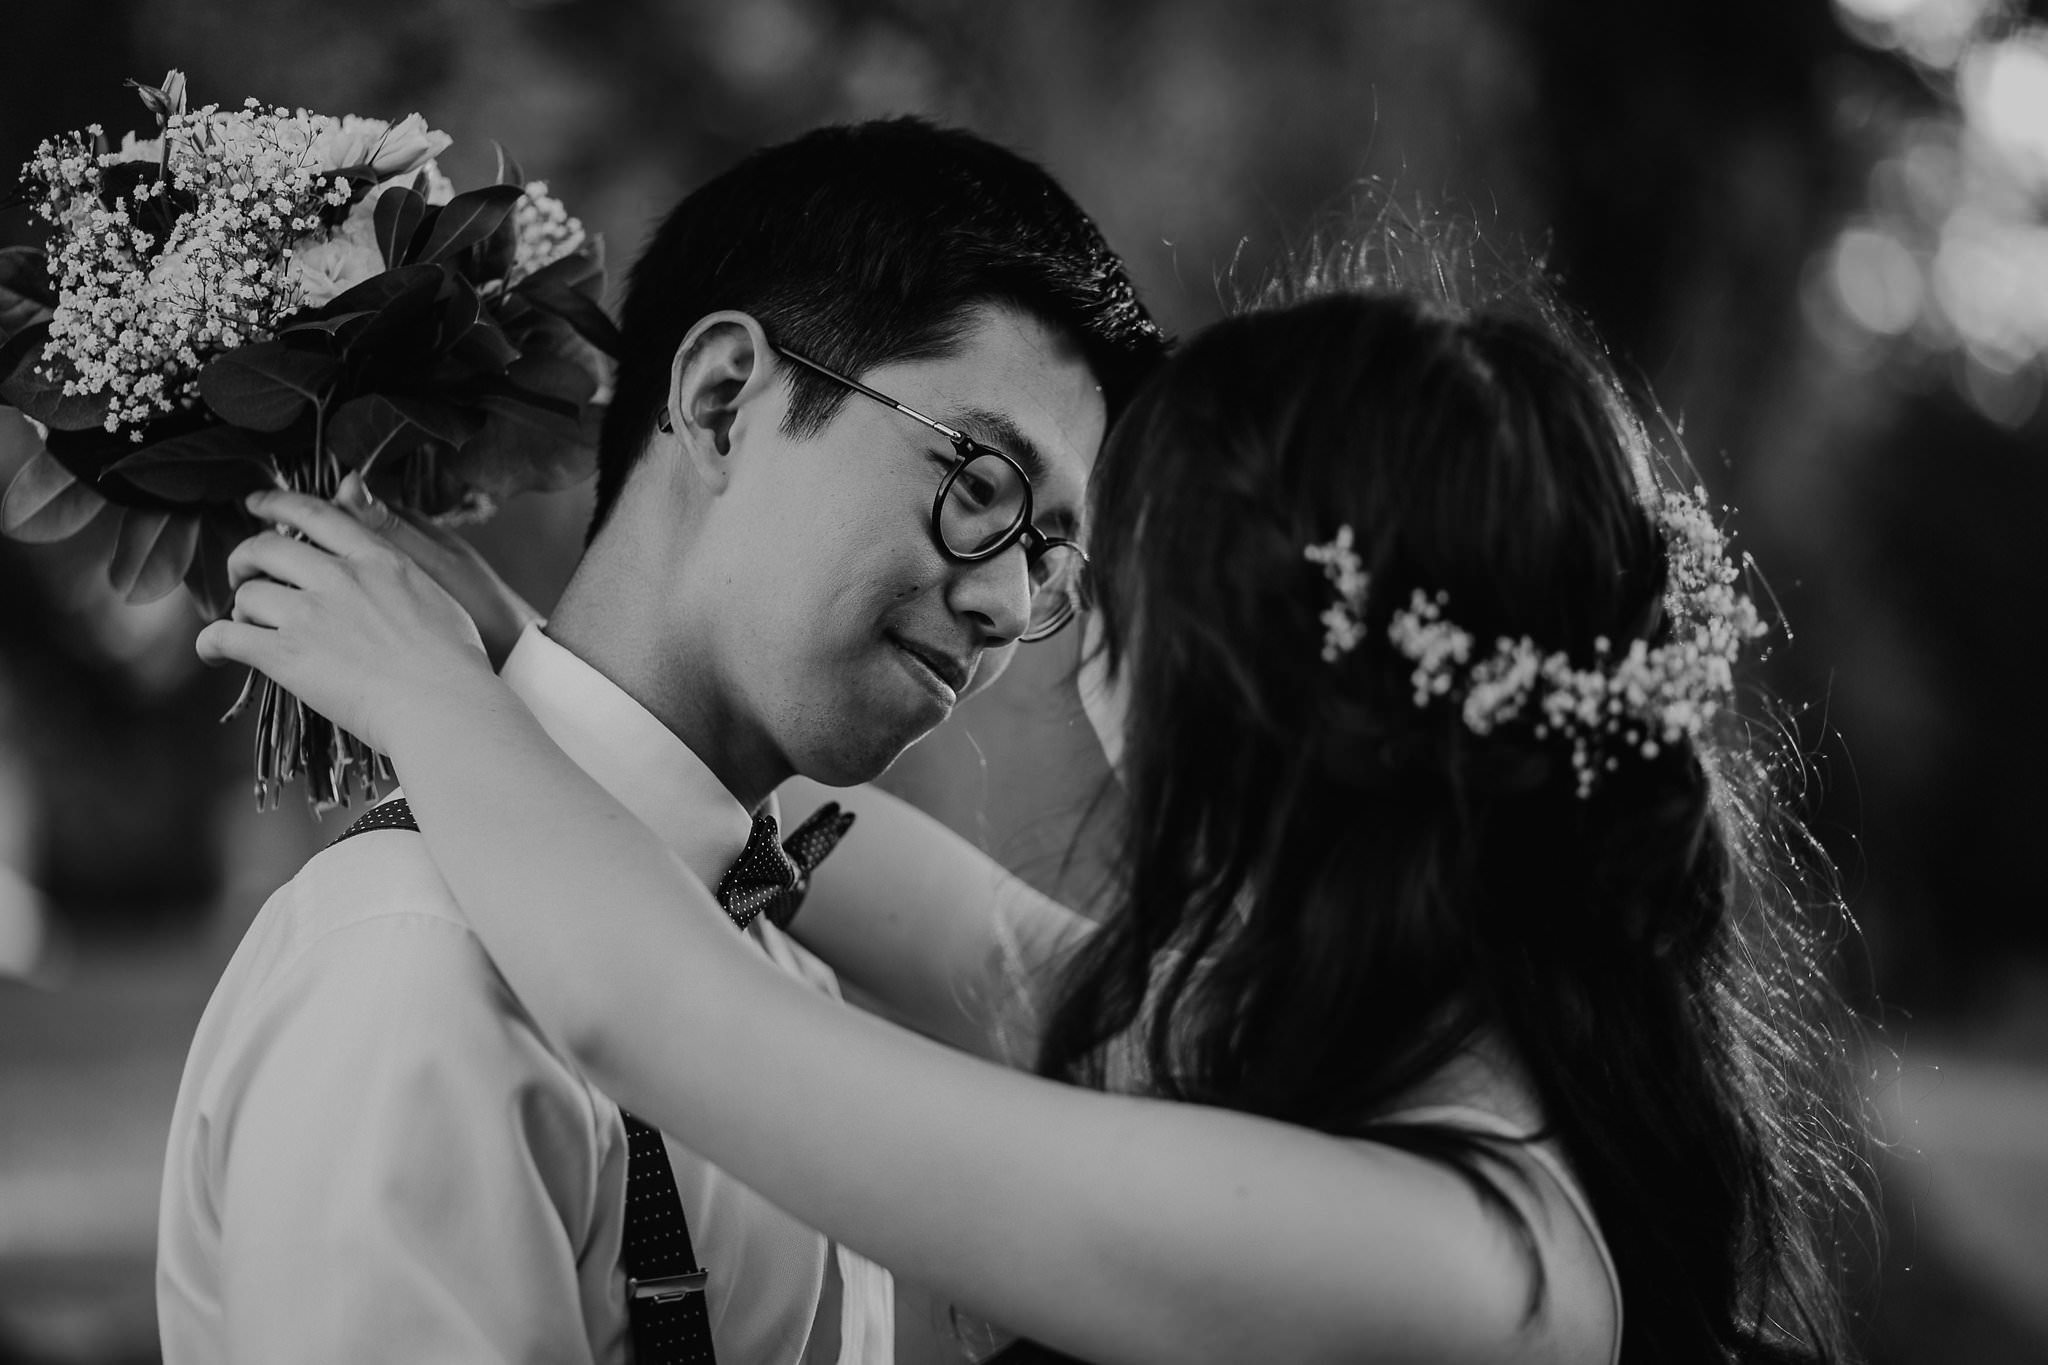 wedding photographer hamilton new zealand 1013 6